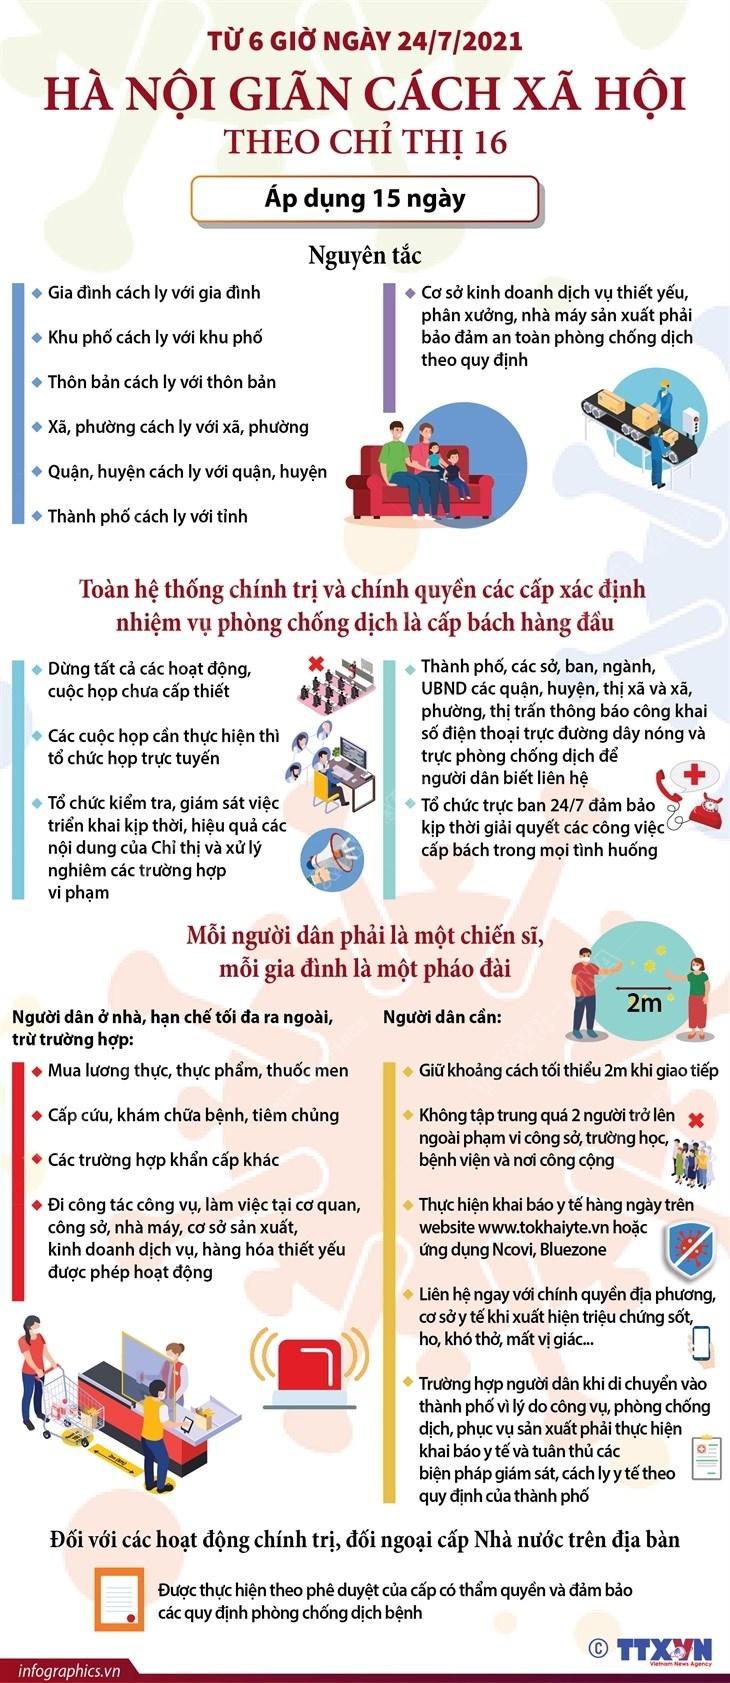 [Infographics] Ha Noi thuc hien gian cach xa hoi theo Chi thi 16 hinh anh 1